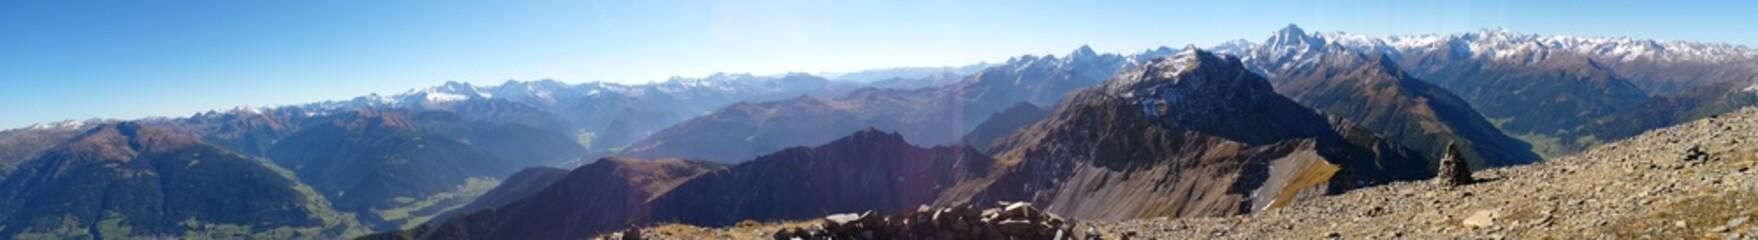 Panorama von Serles